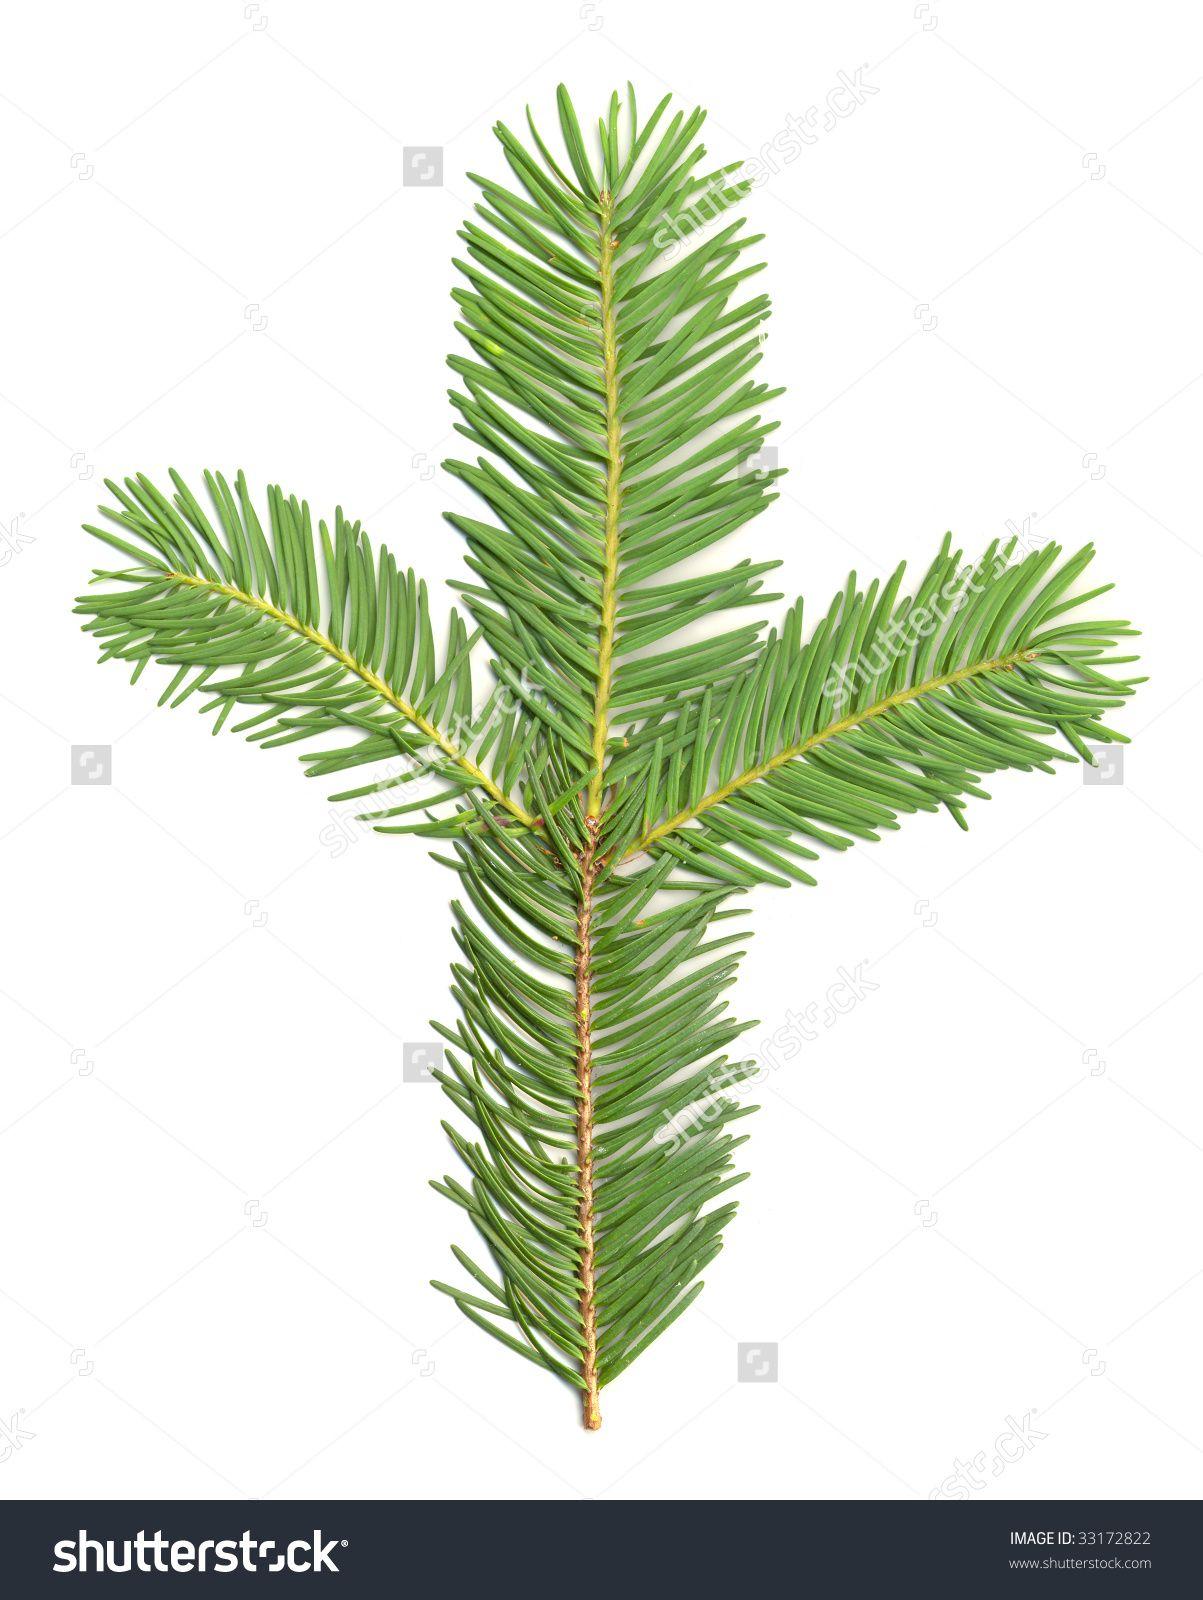 Douglas Fir Christmas Tree Stock Photos, Images, & Pictures